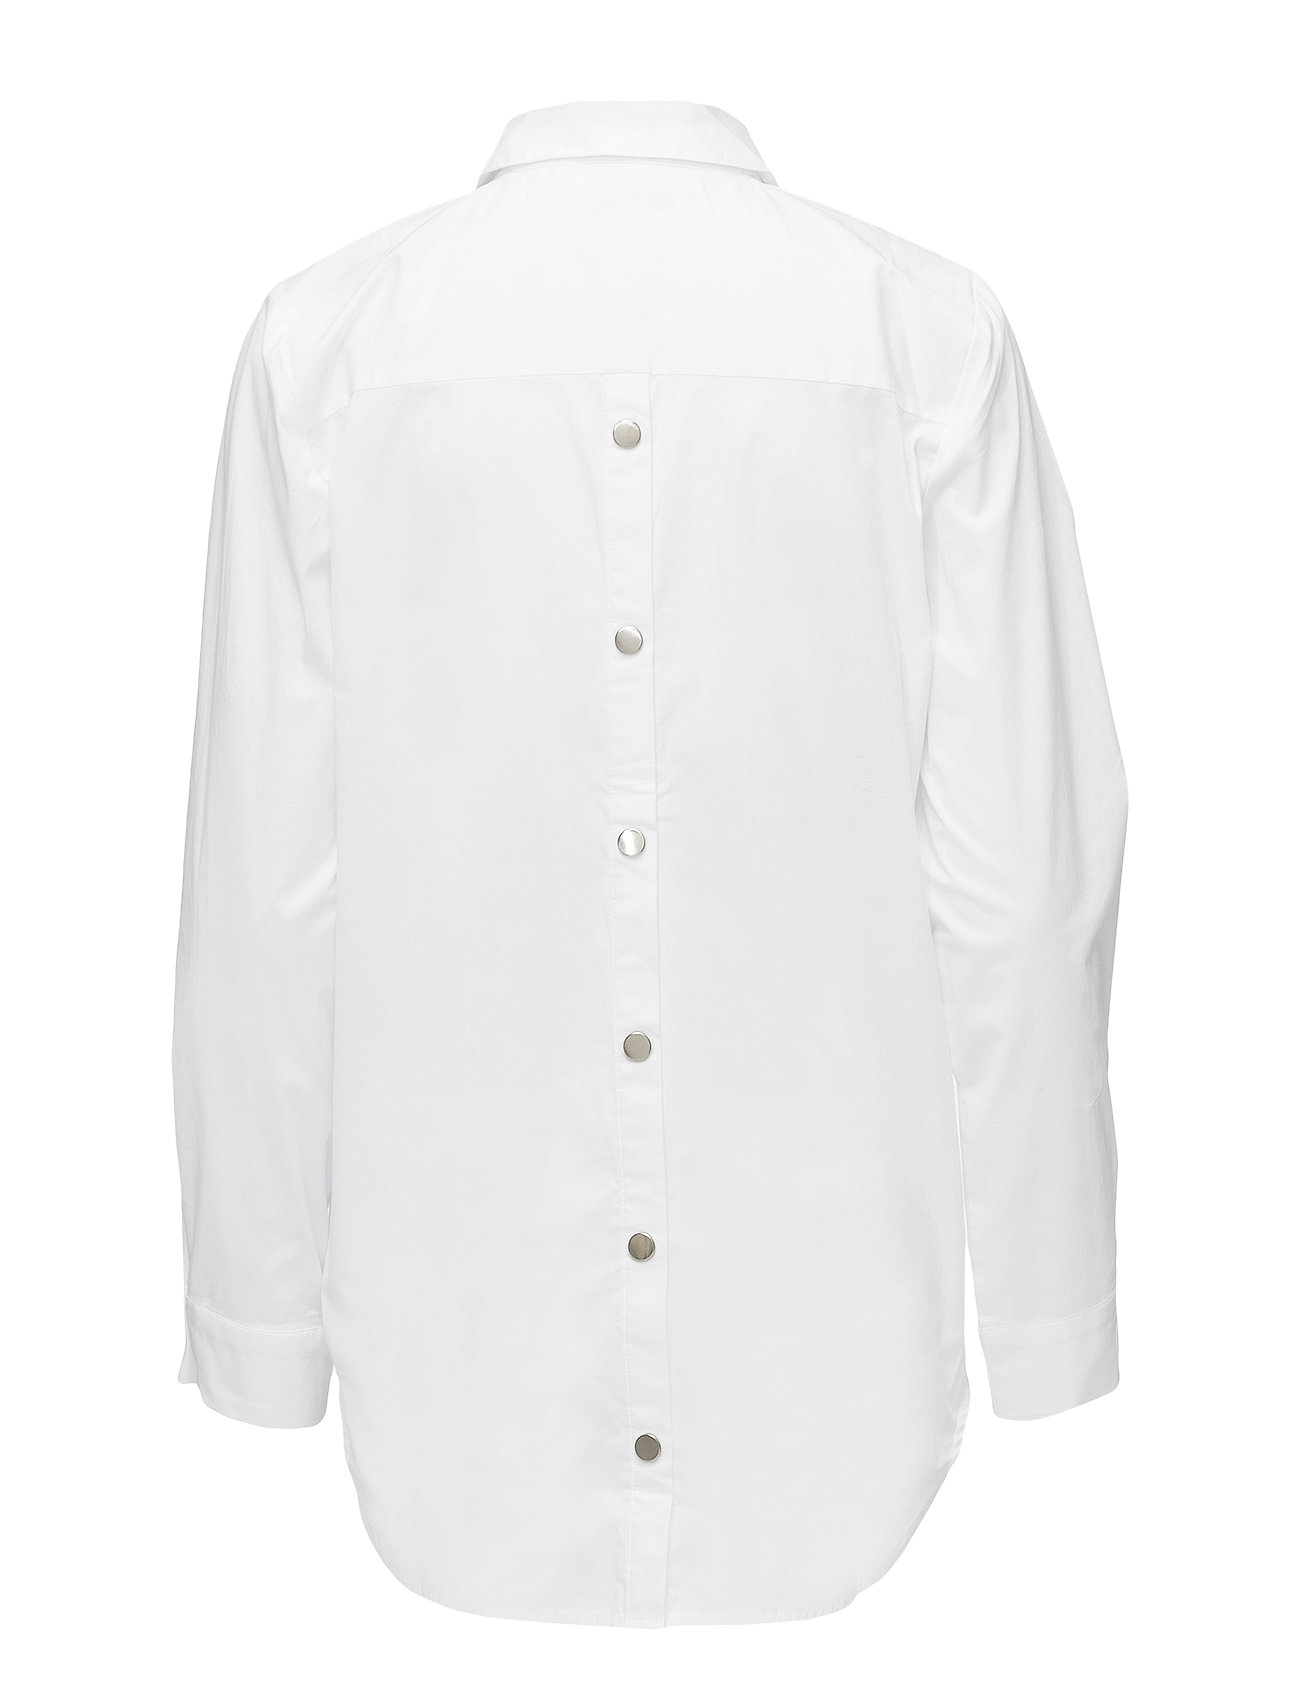 Ms18bright Kaya Shirt Ms18bright Shirt WhiteGestuz WhiteGestuz Kaya Kaya Shirt Kaya Ms18bright WhiteGestuz xWQCorBde